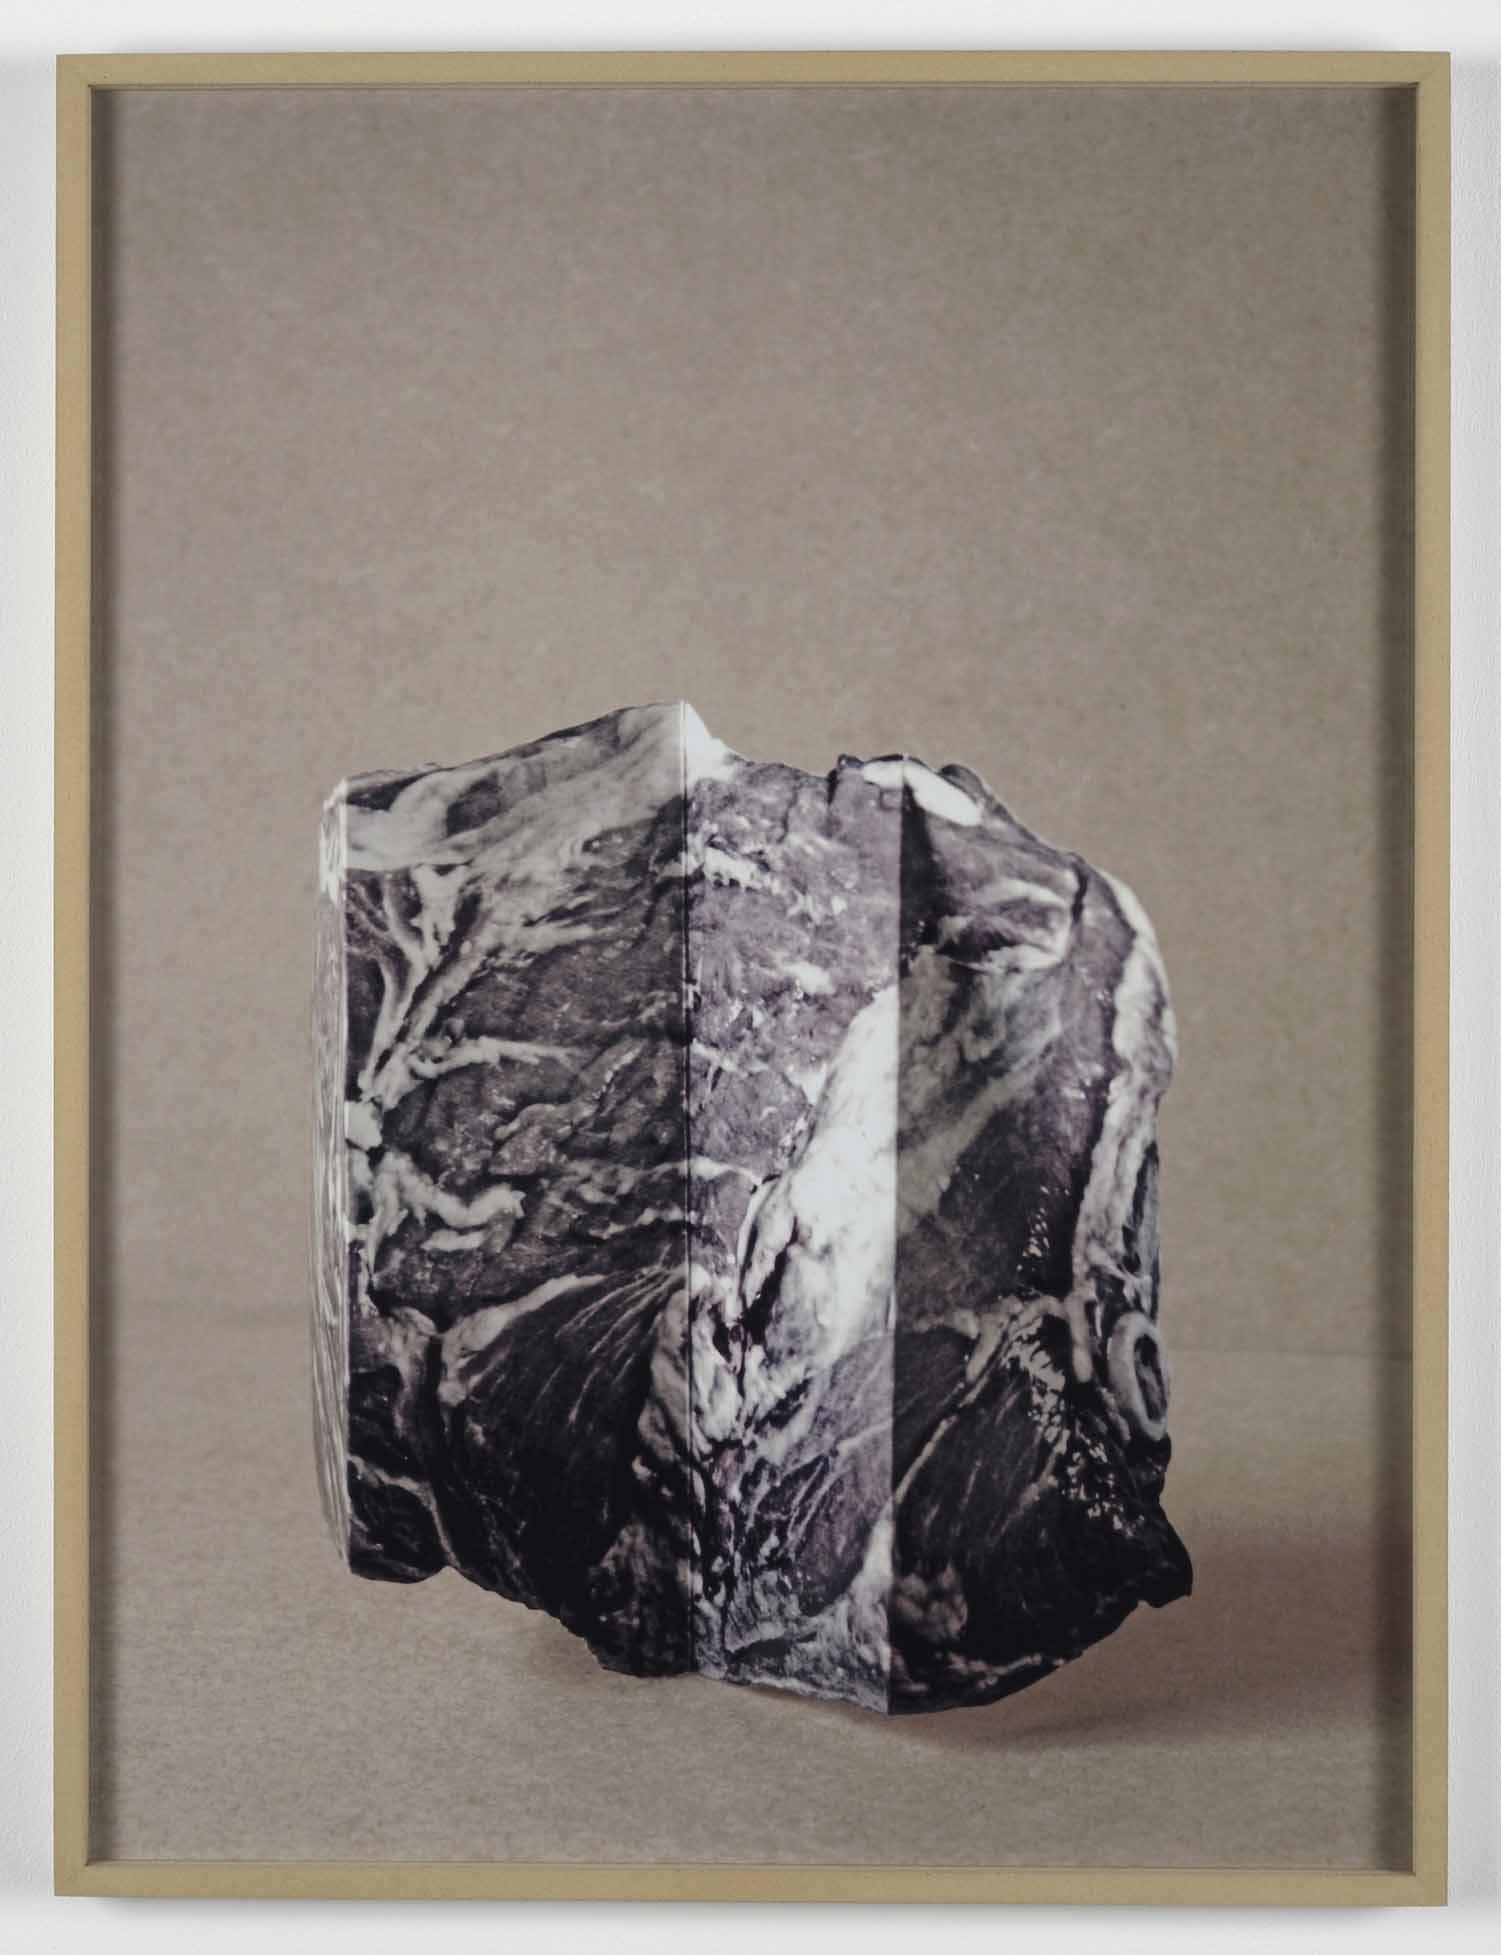 in (working title)   2011   Digital c-print   72.5 x 54.5 cm / 28.5 x 21.5 in framed